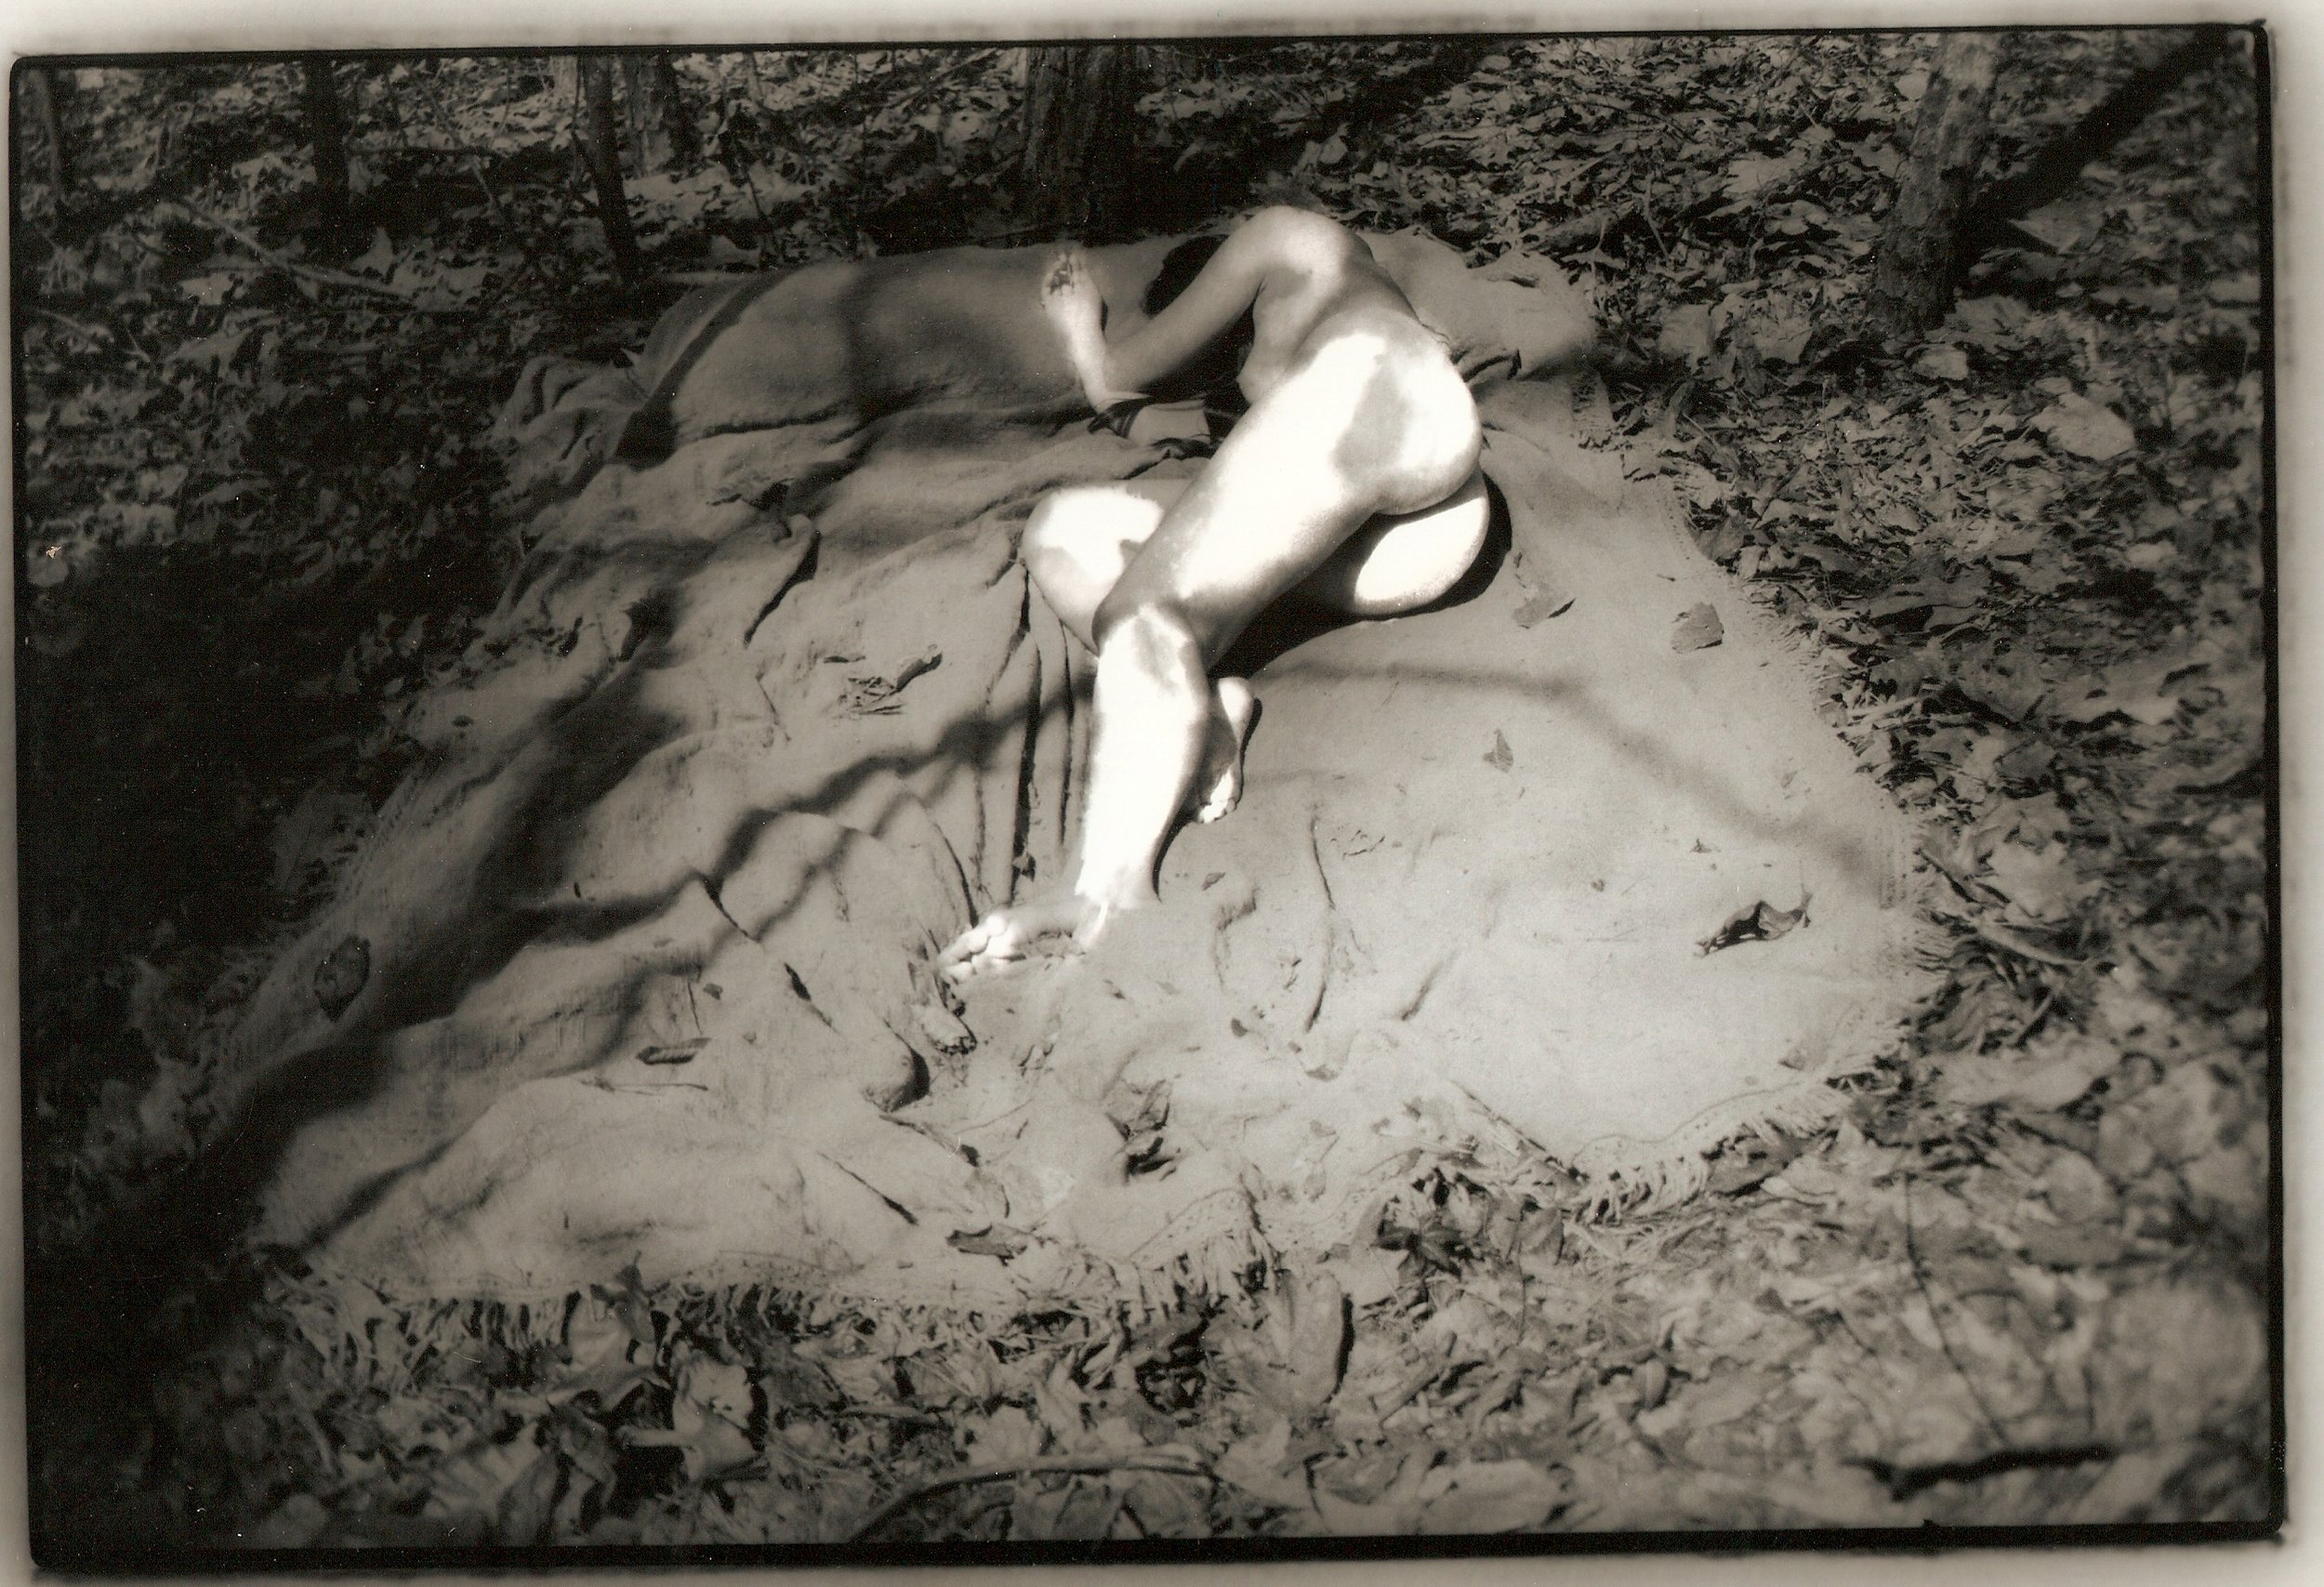 A Gray Peaceful Sleep in North Carolina IV 8 x 10 in 300 dpi.jpg